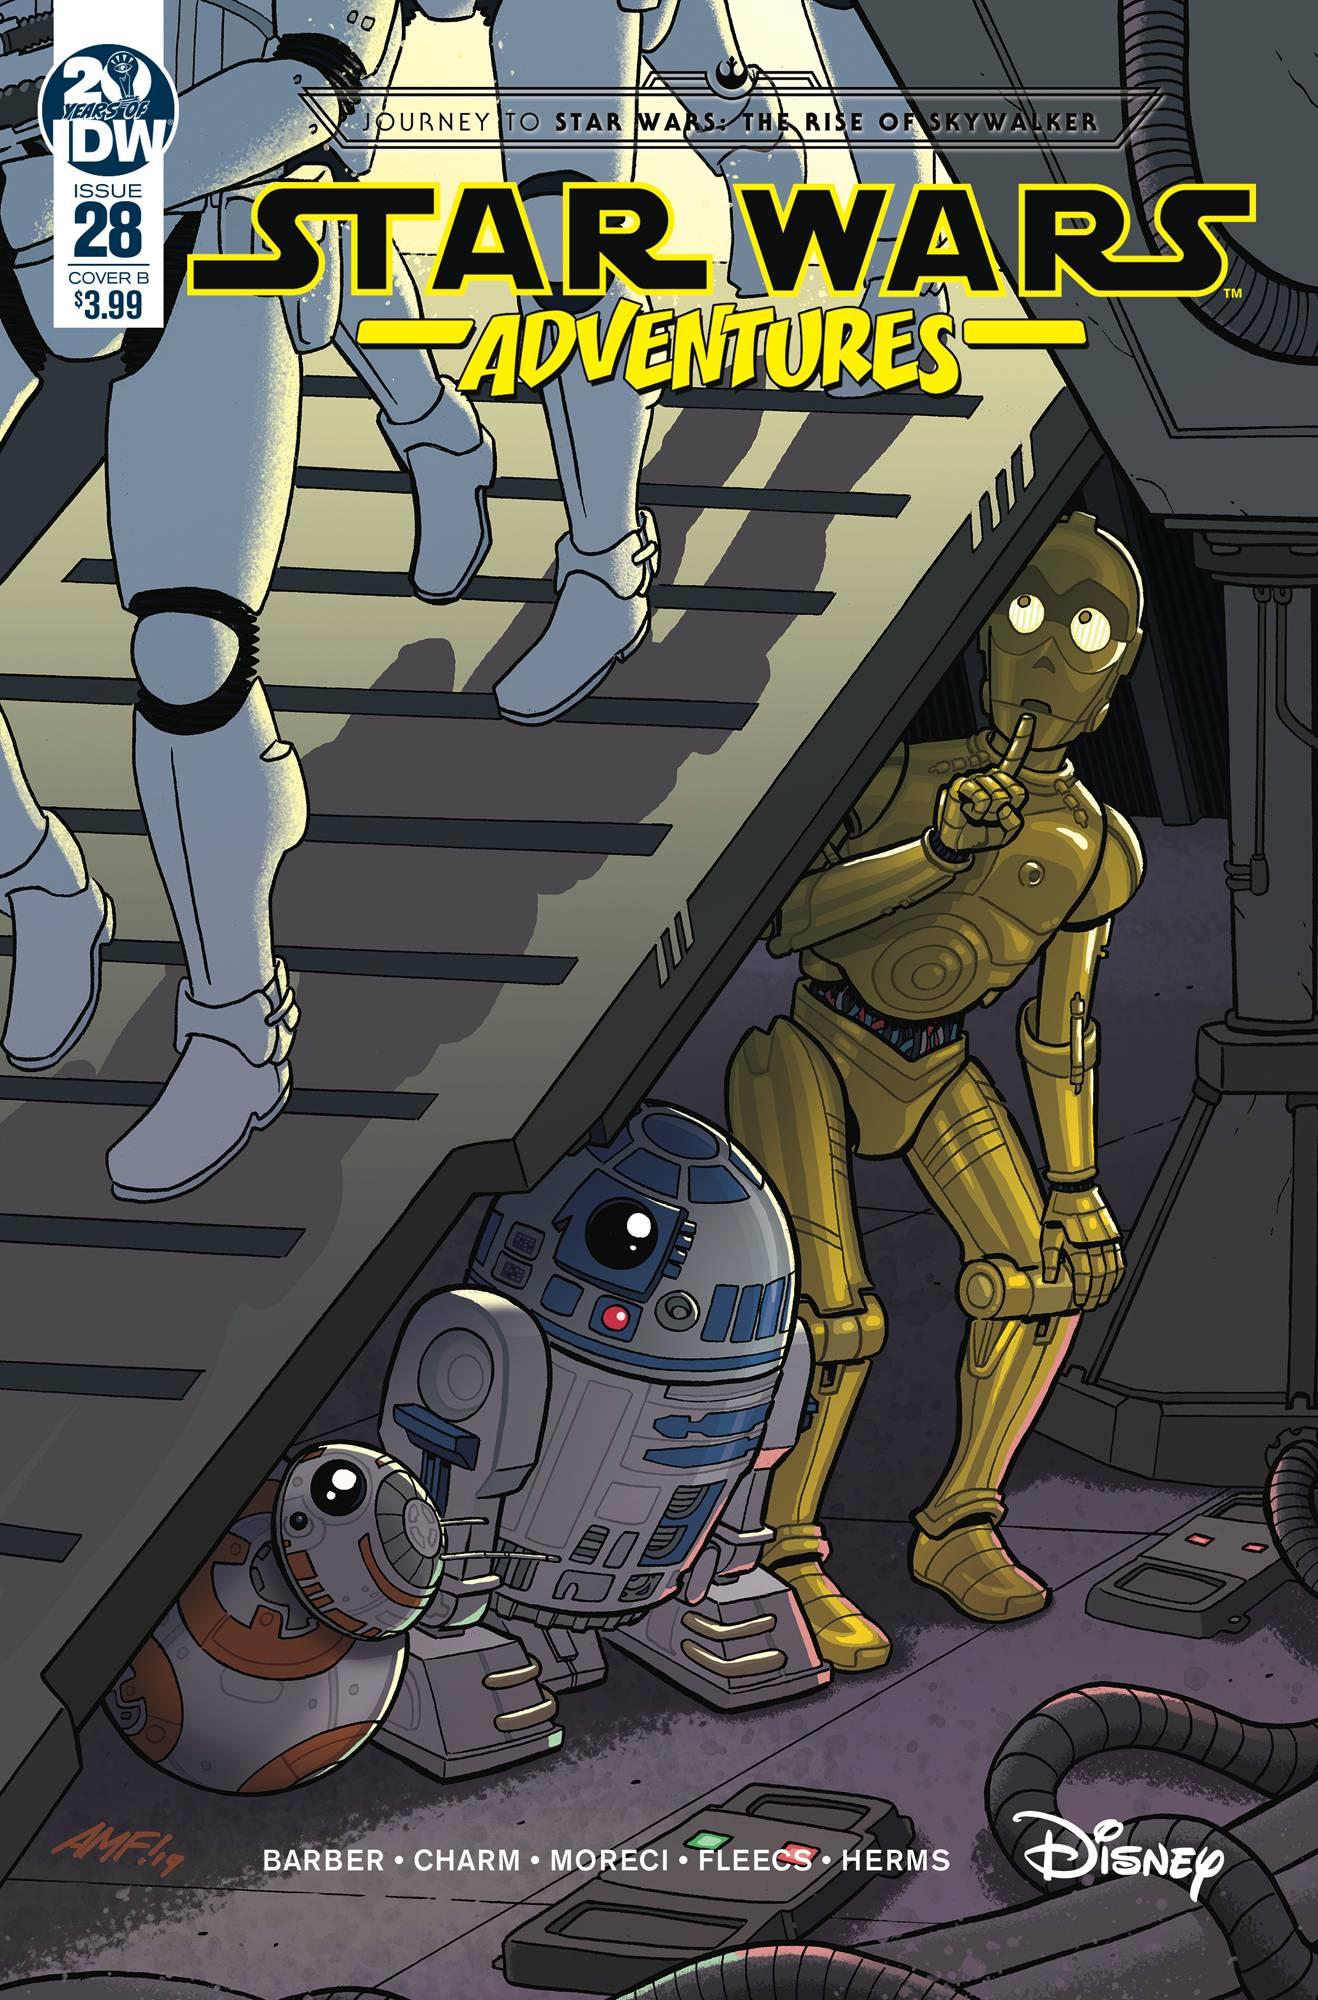 Star Wars Adventures #28 (2019)